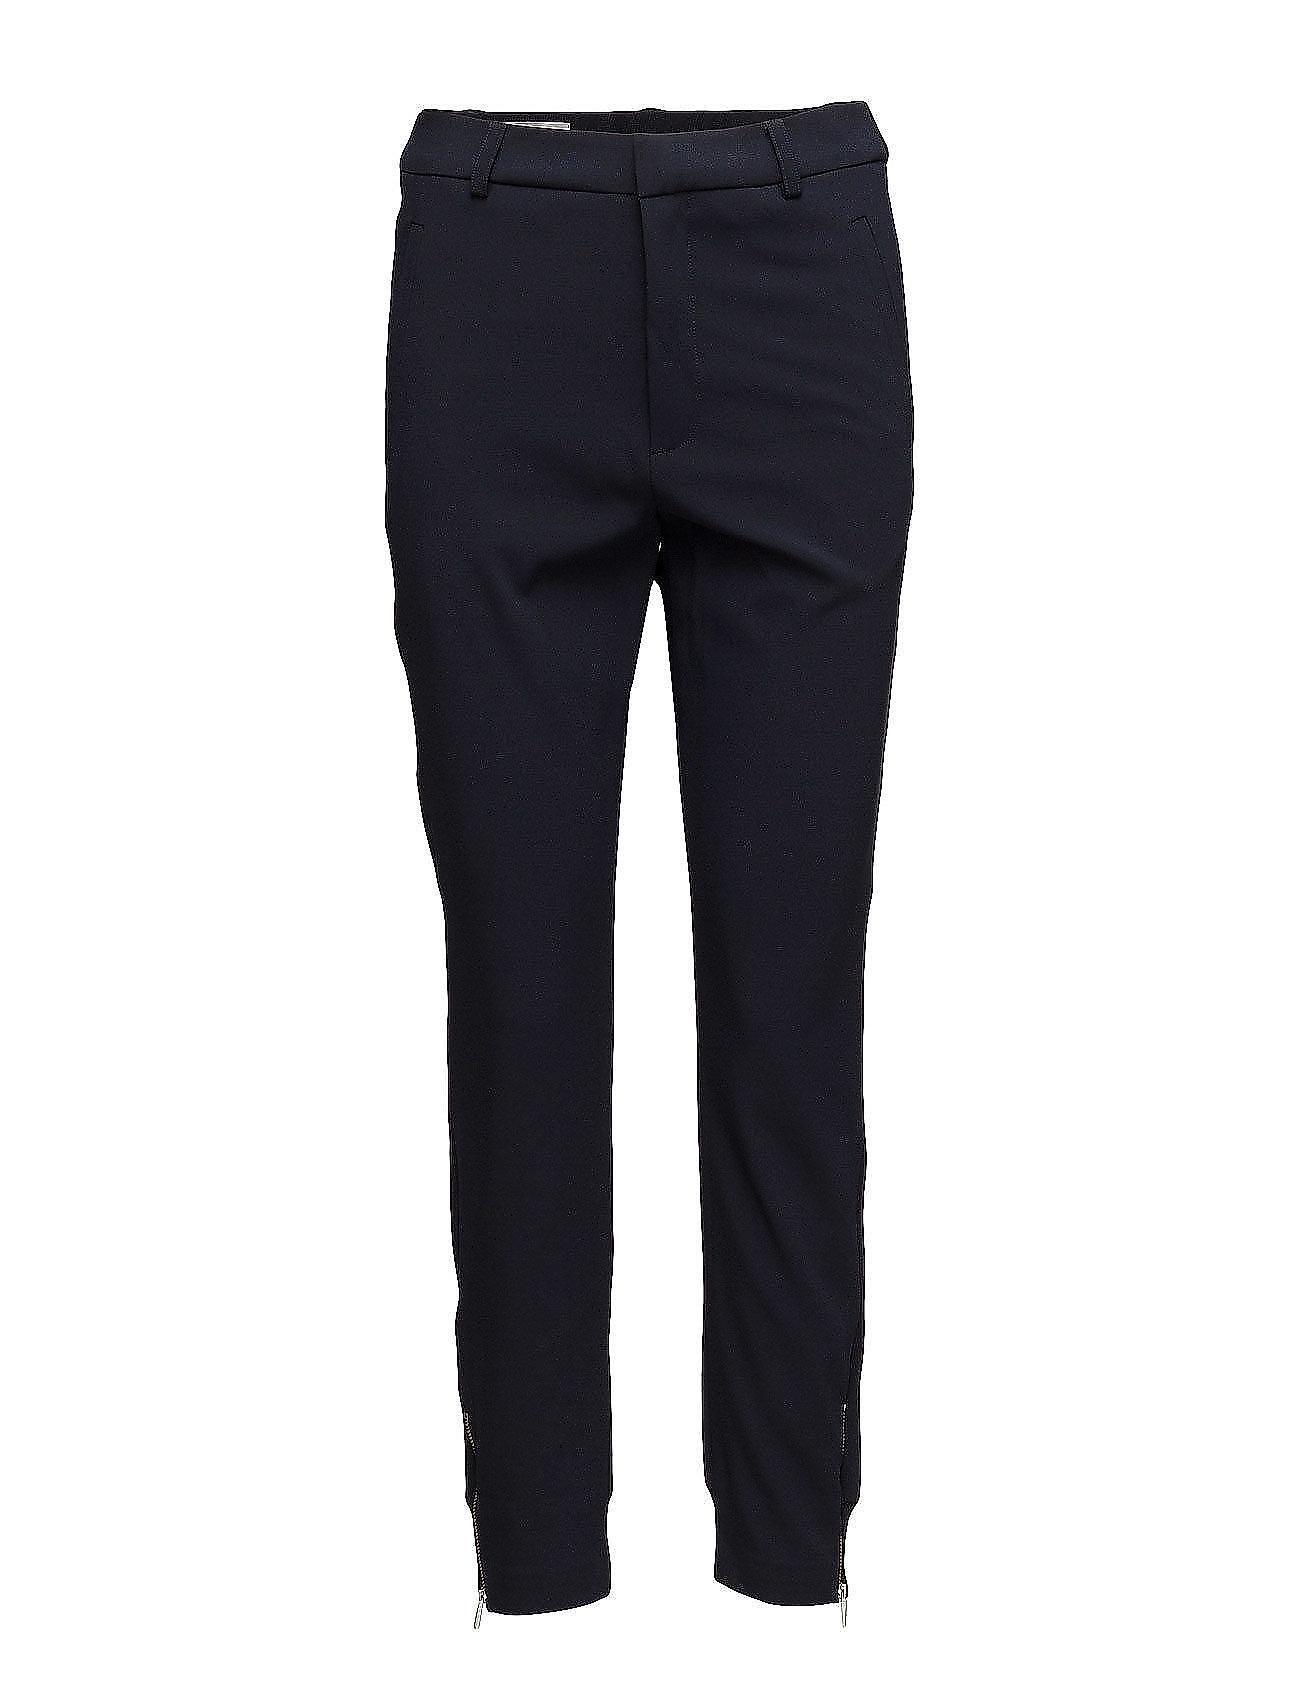 Nica Nica L BlueInwear L BlueInwear L Nica BlueInwear Pantsmarine Pantsmarine Pantsmarine Nica ZPkXiwOTu